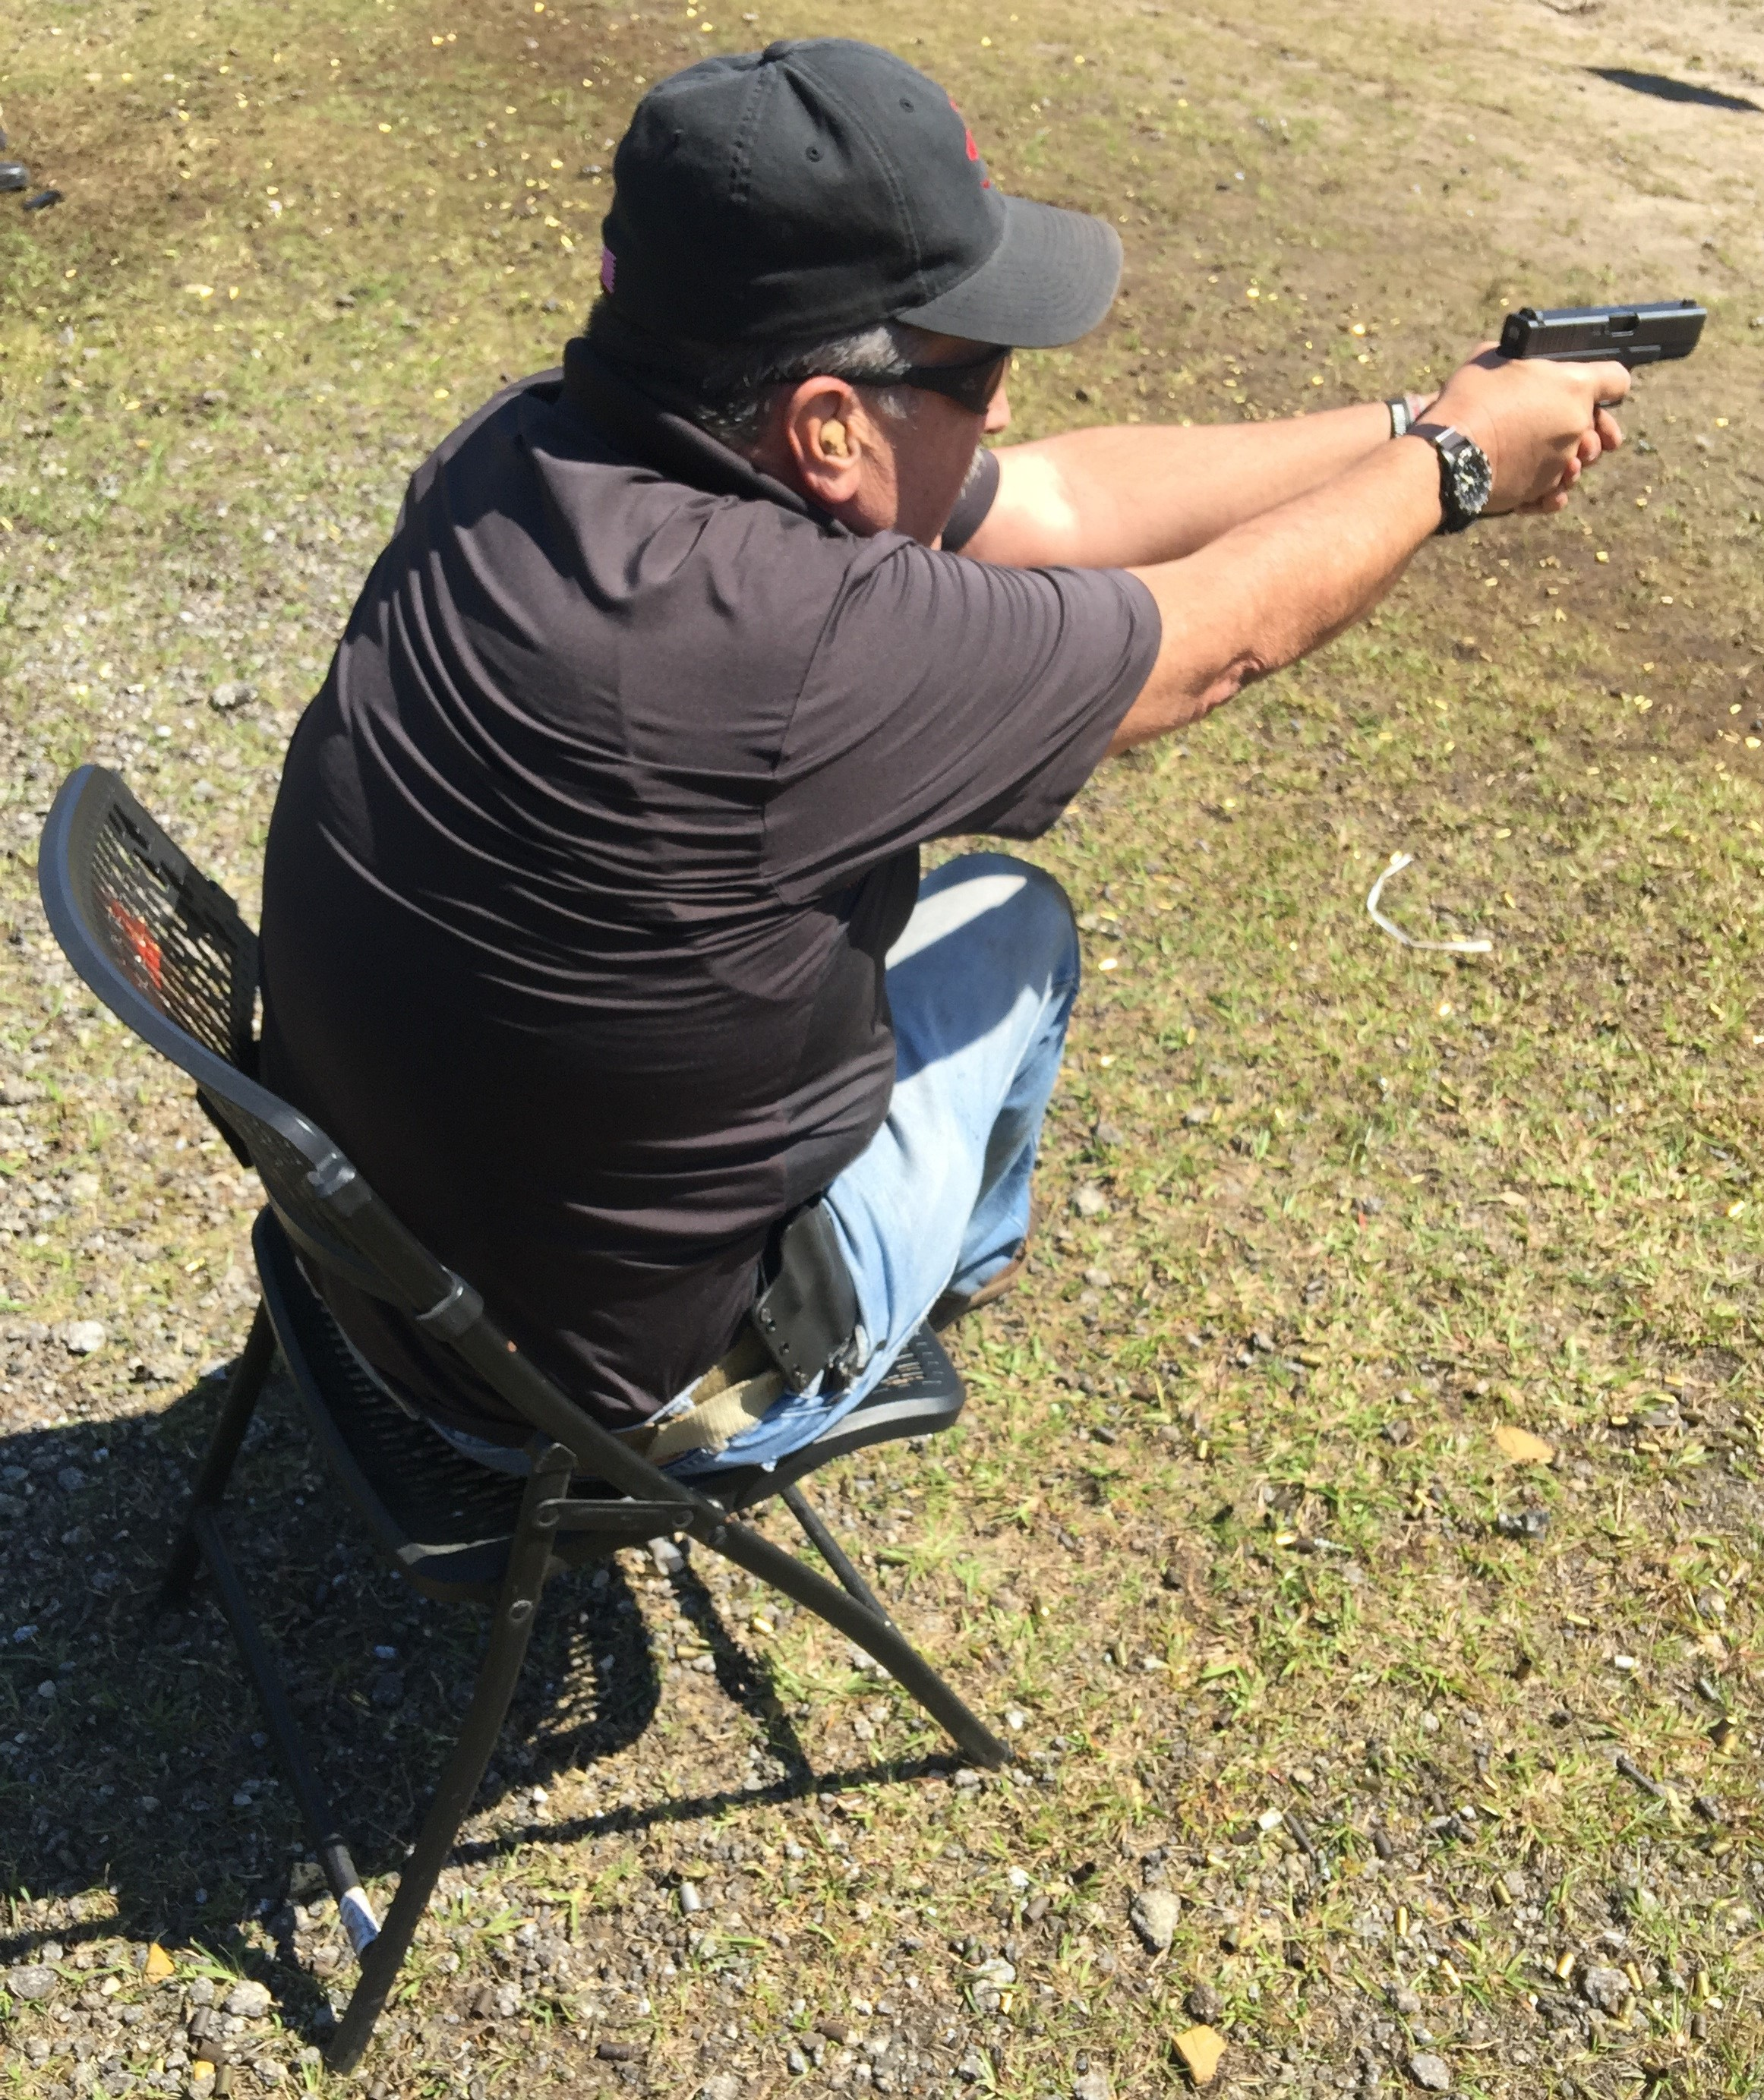 unorthodox shooting positions